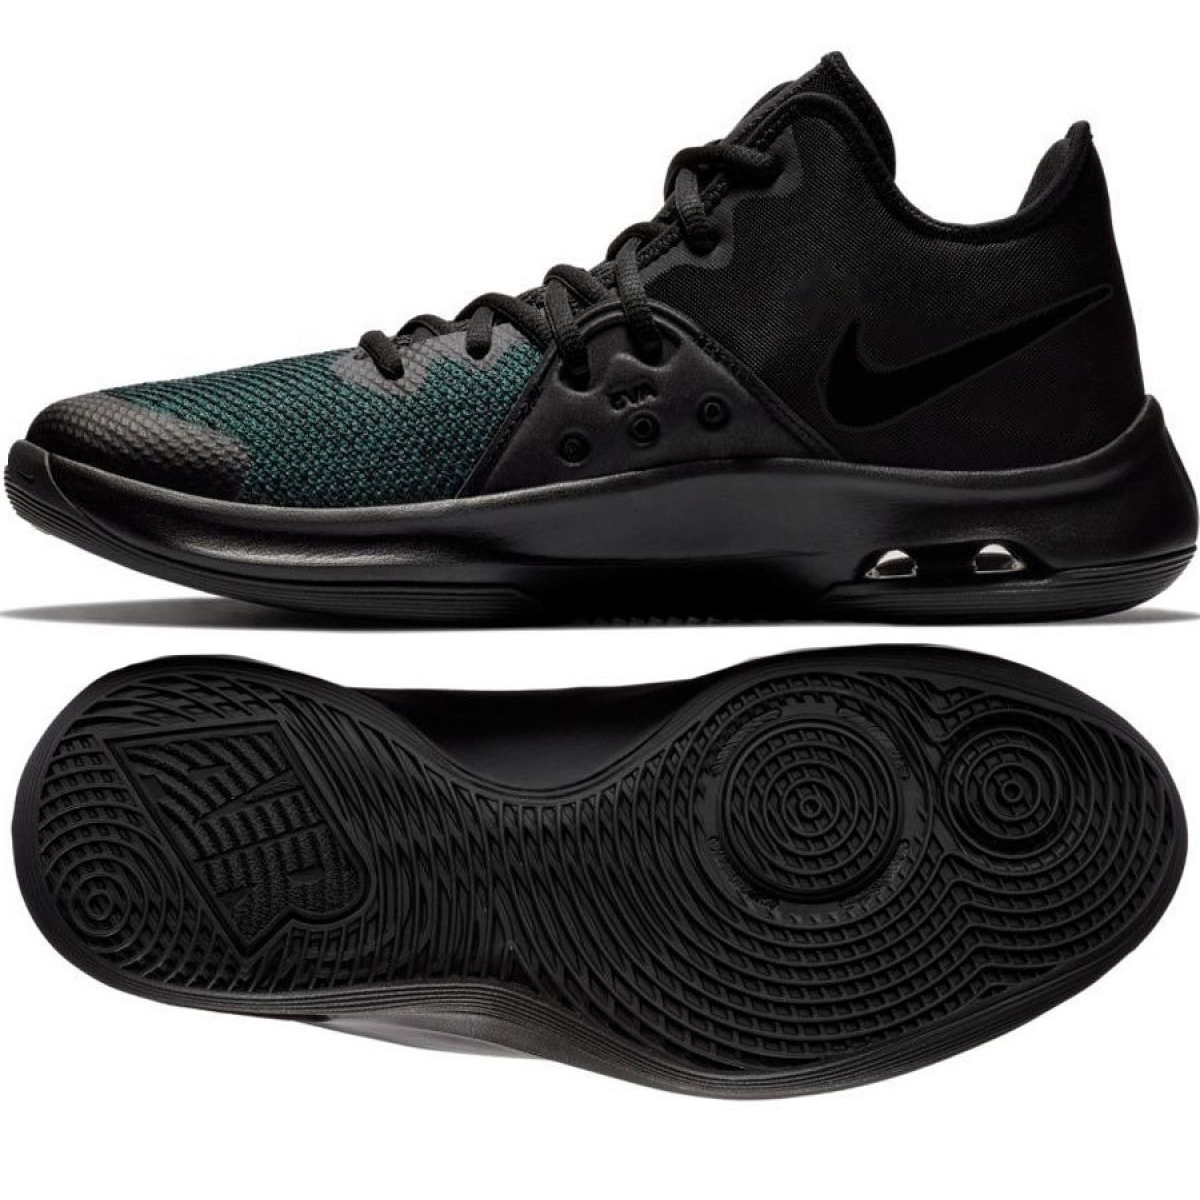 Kosárlabda cipő Nike Air Versitile Iii M AO4430 002 fekete fekete